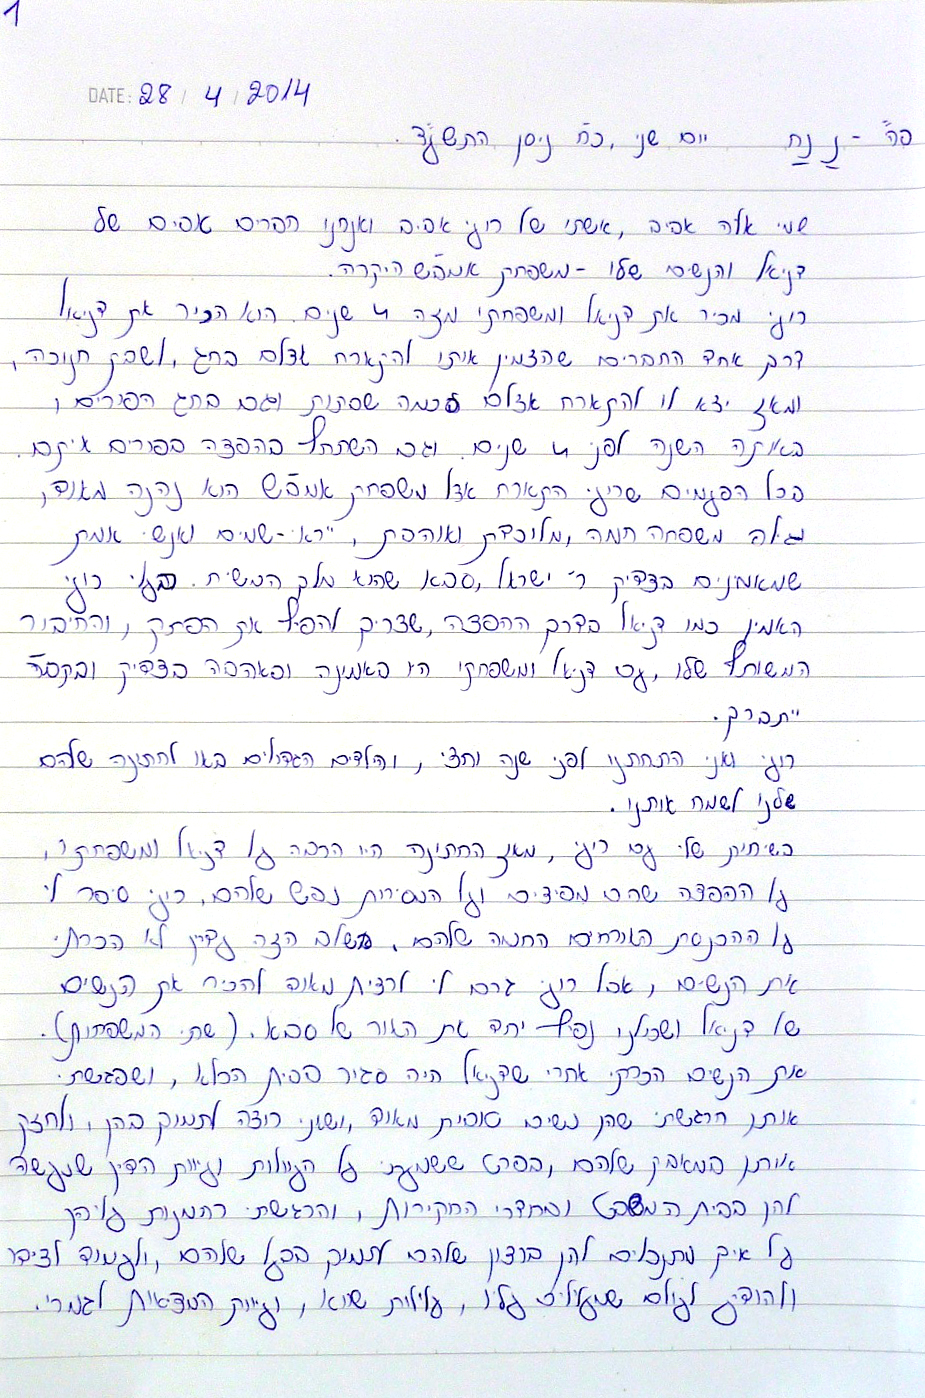 testimonie of Elia Aviv 1. .JPG